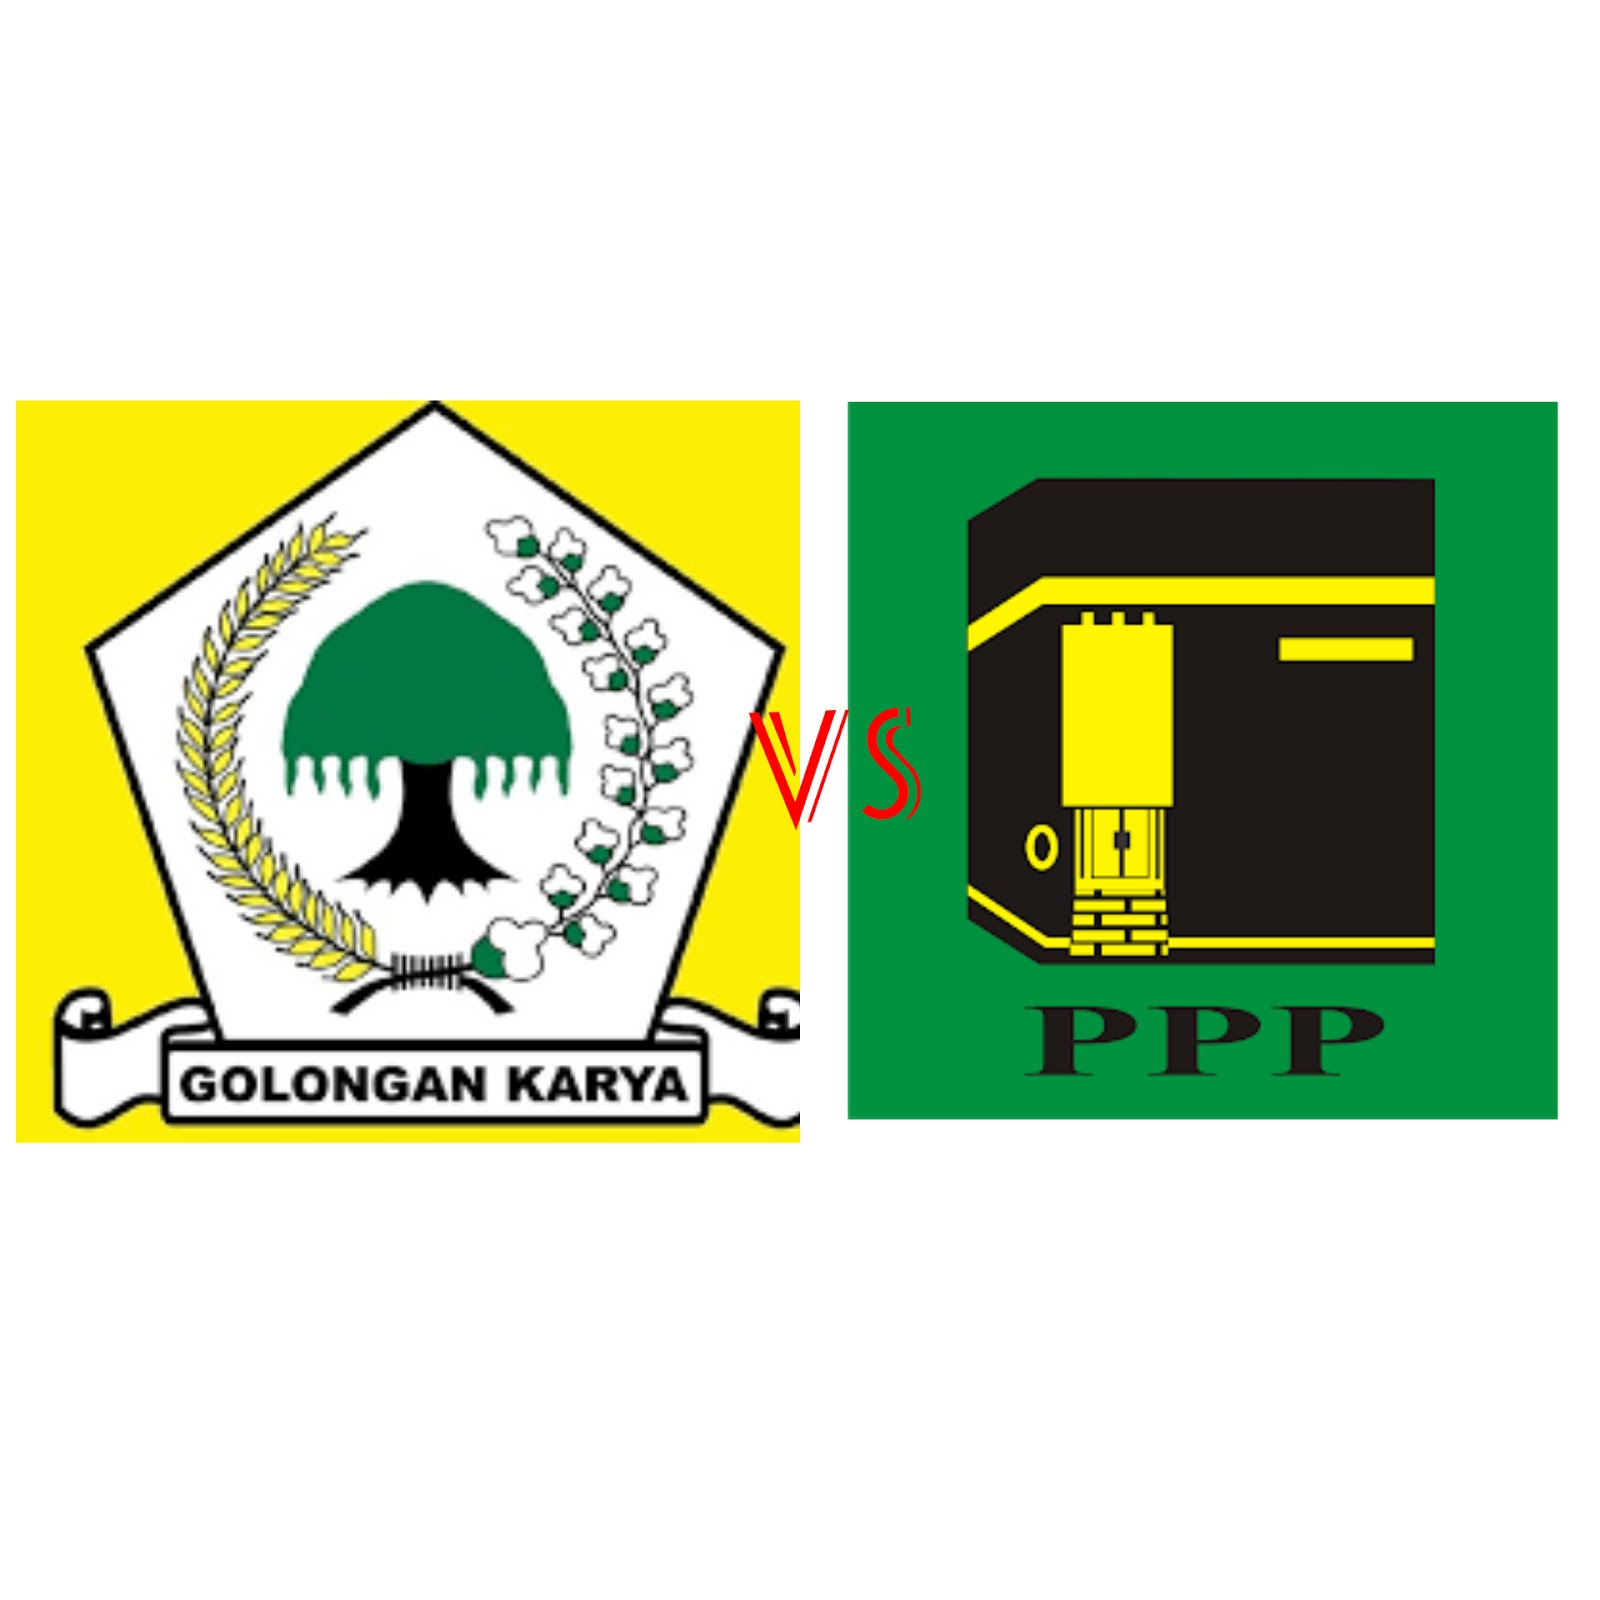 Golkar Tidak Takut Koalisi Gemuk Ppp Di Dprd Majene Masalembo